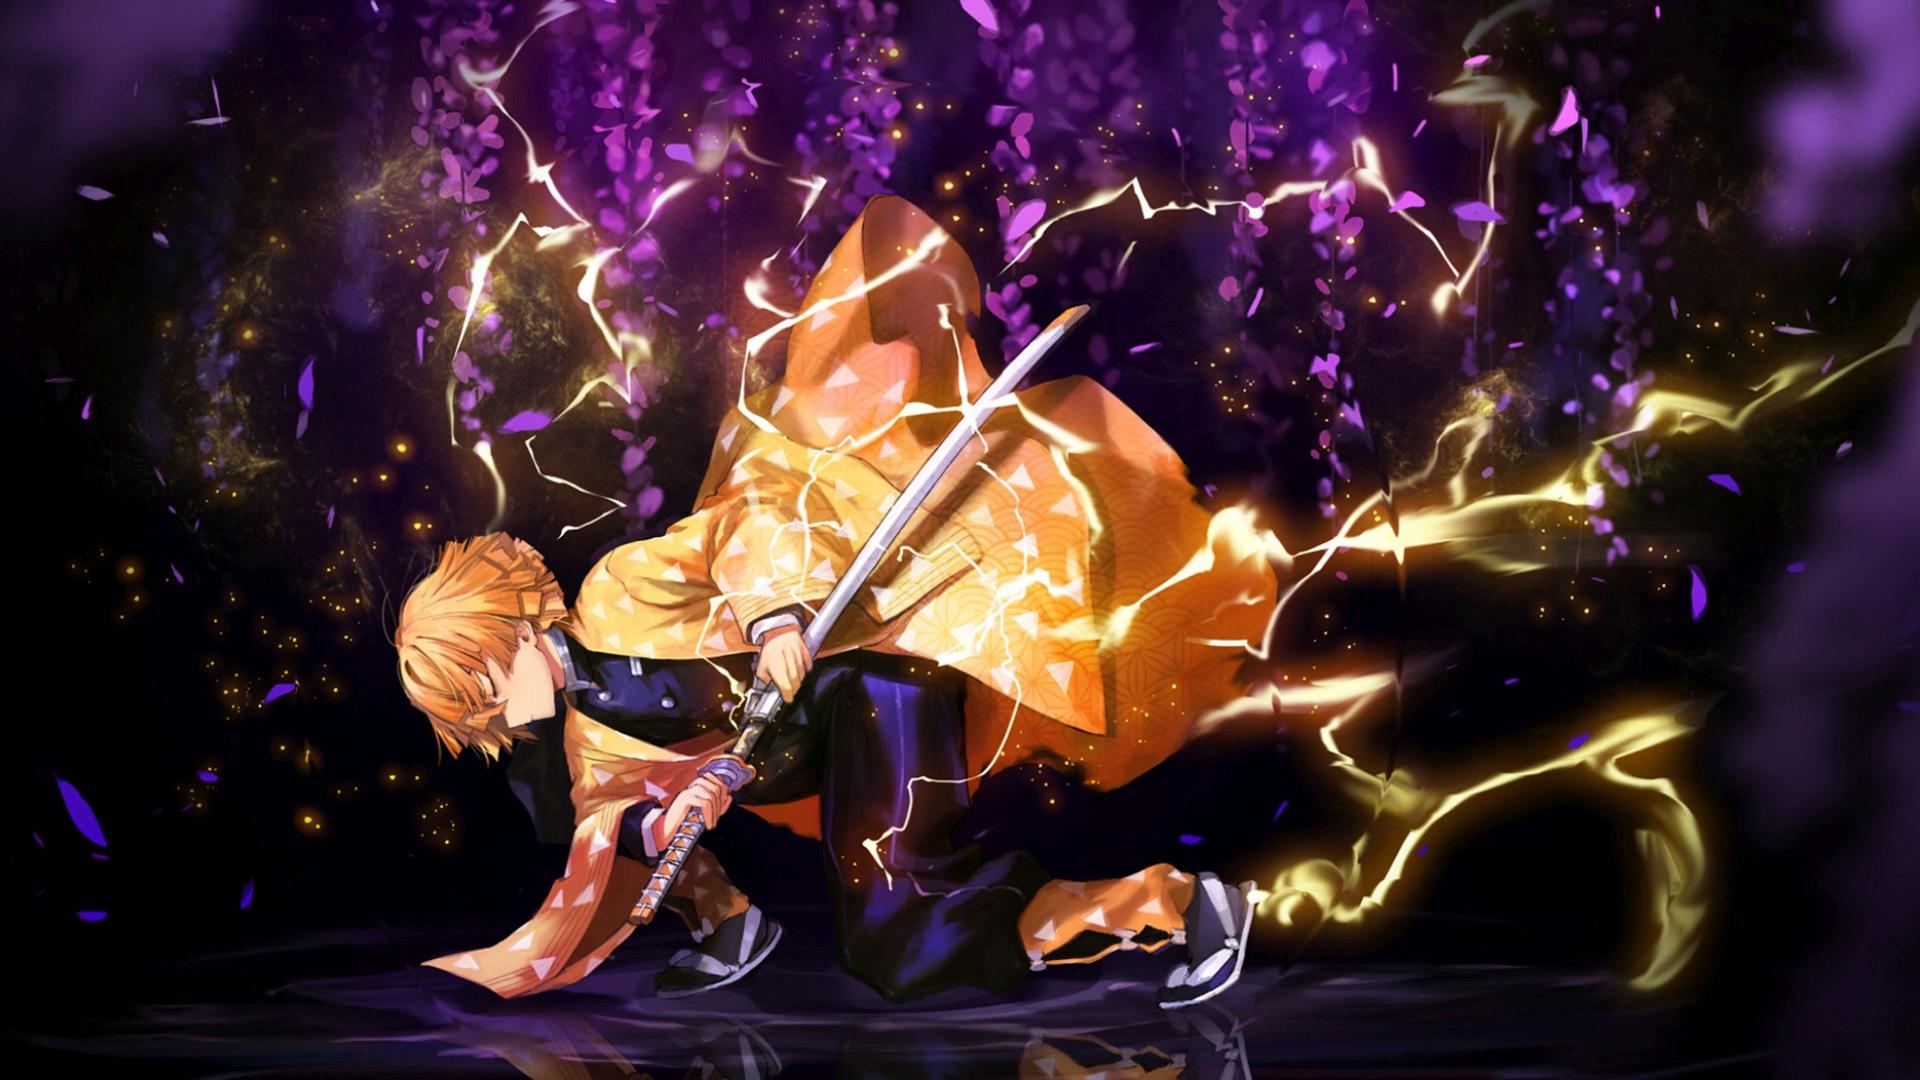 Demon Slayer 1080p wallpaper